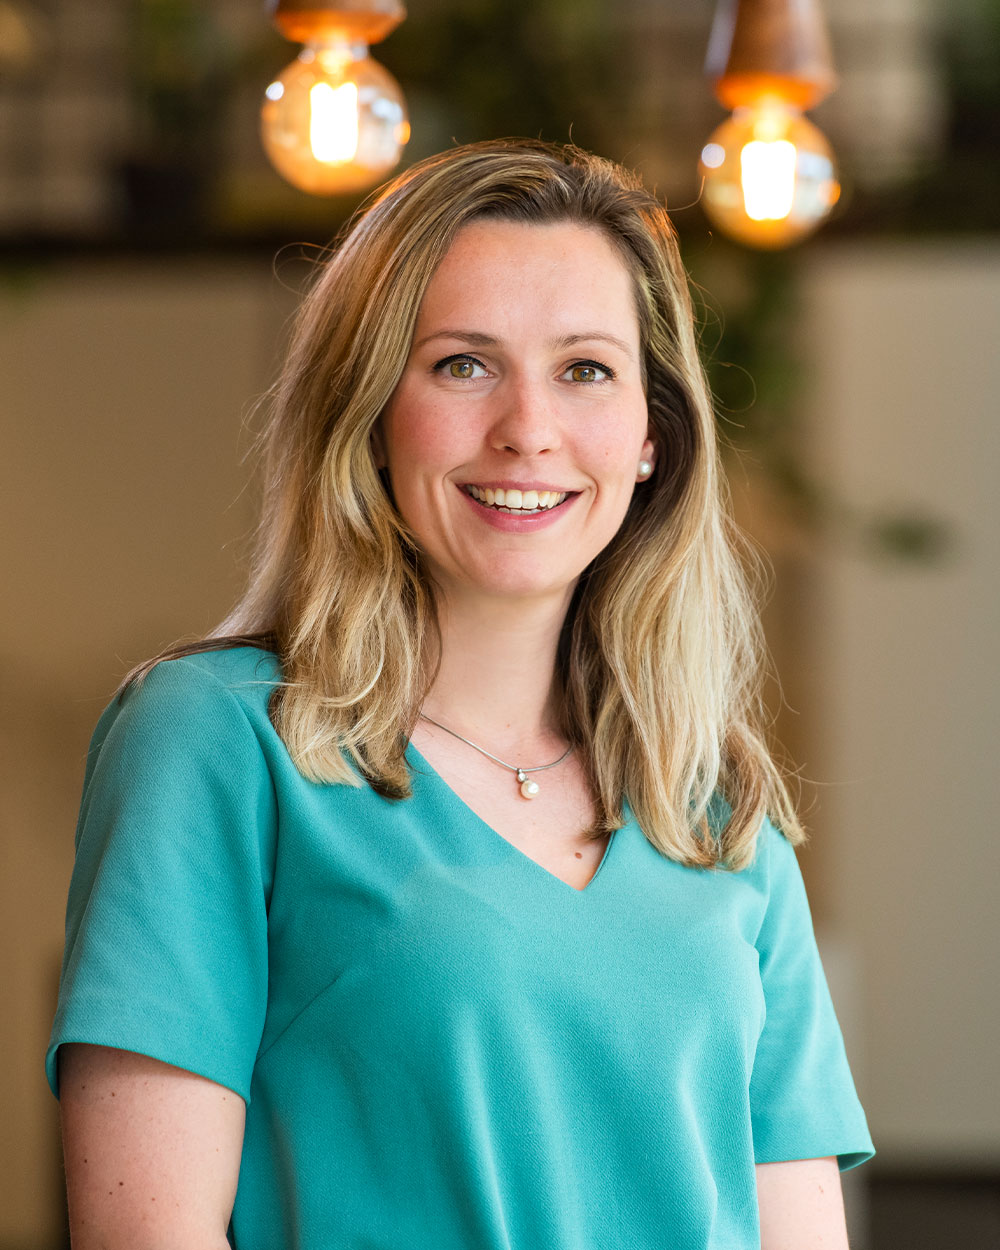 Roos Compaijen, Projectmanager bij Bright